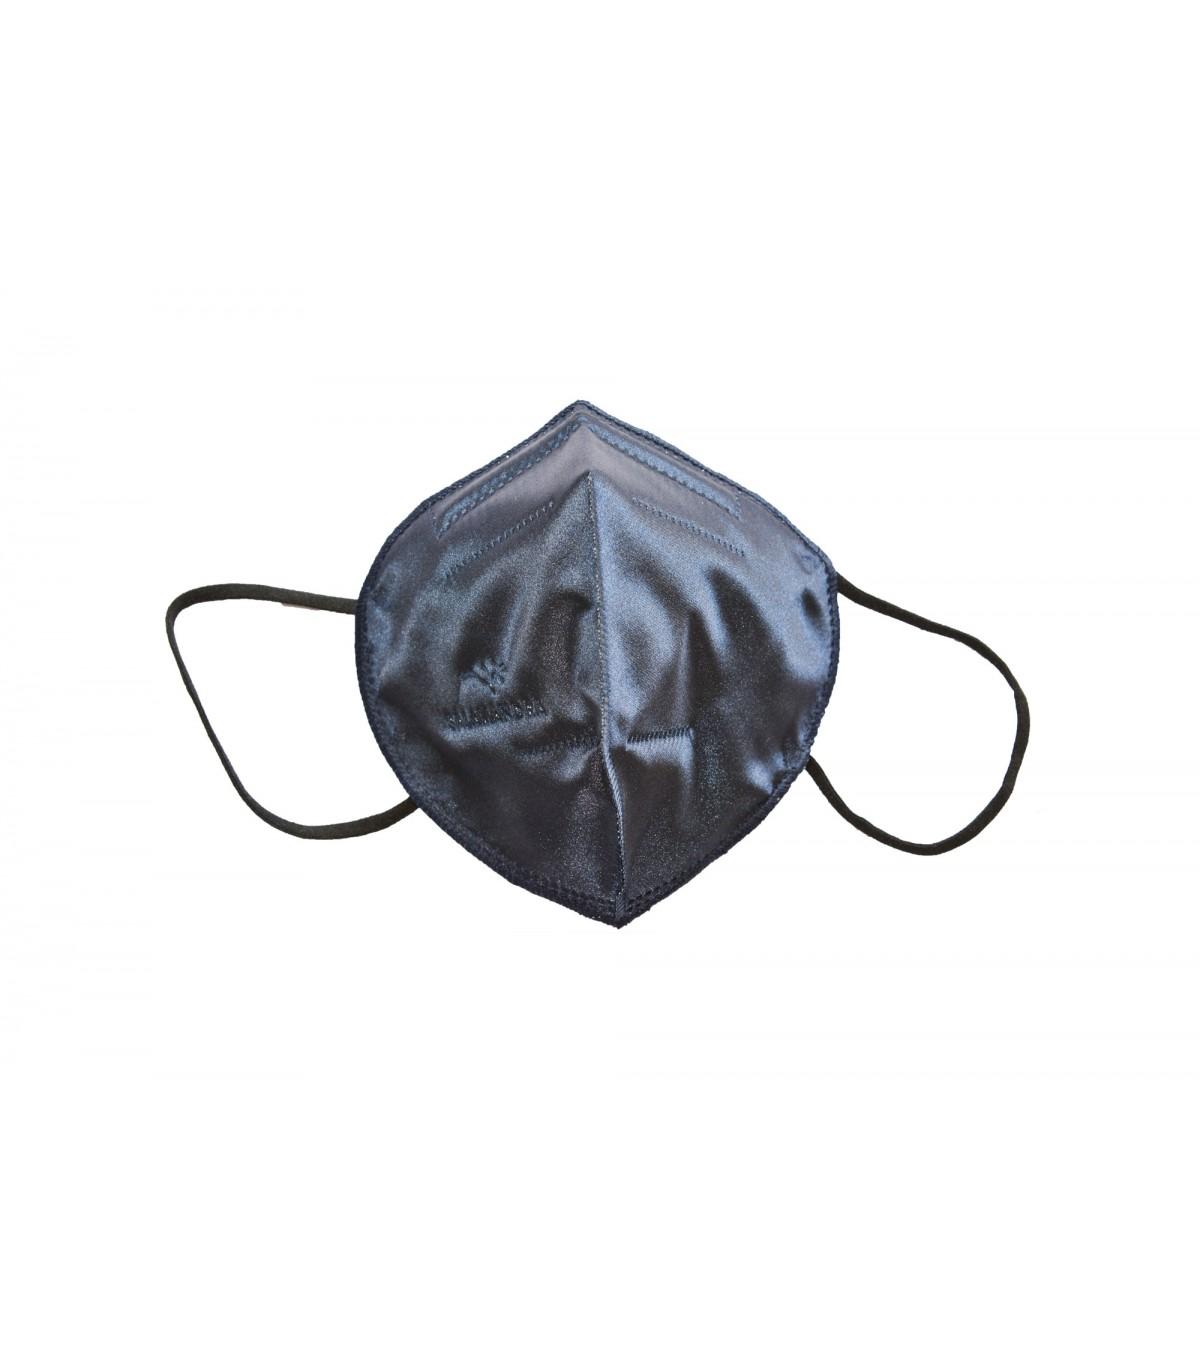 FFP2 face mask - MFNR102